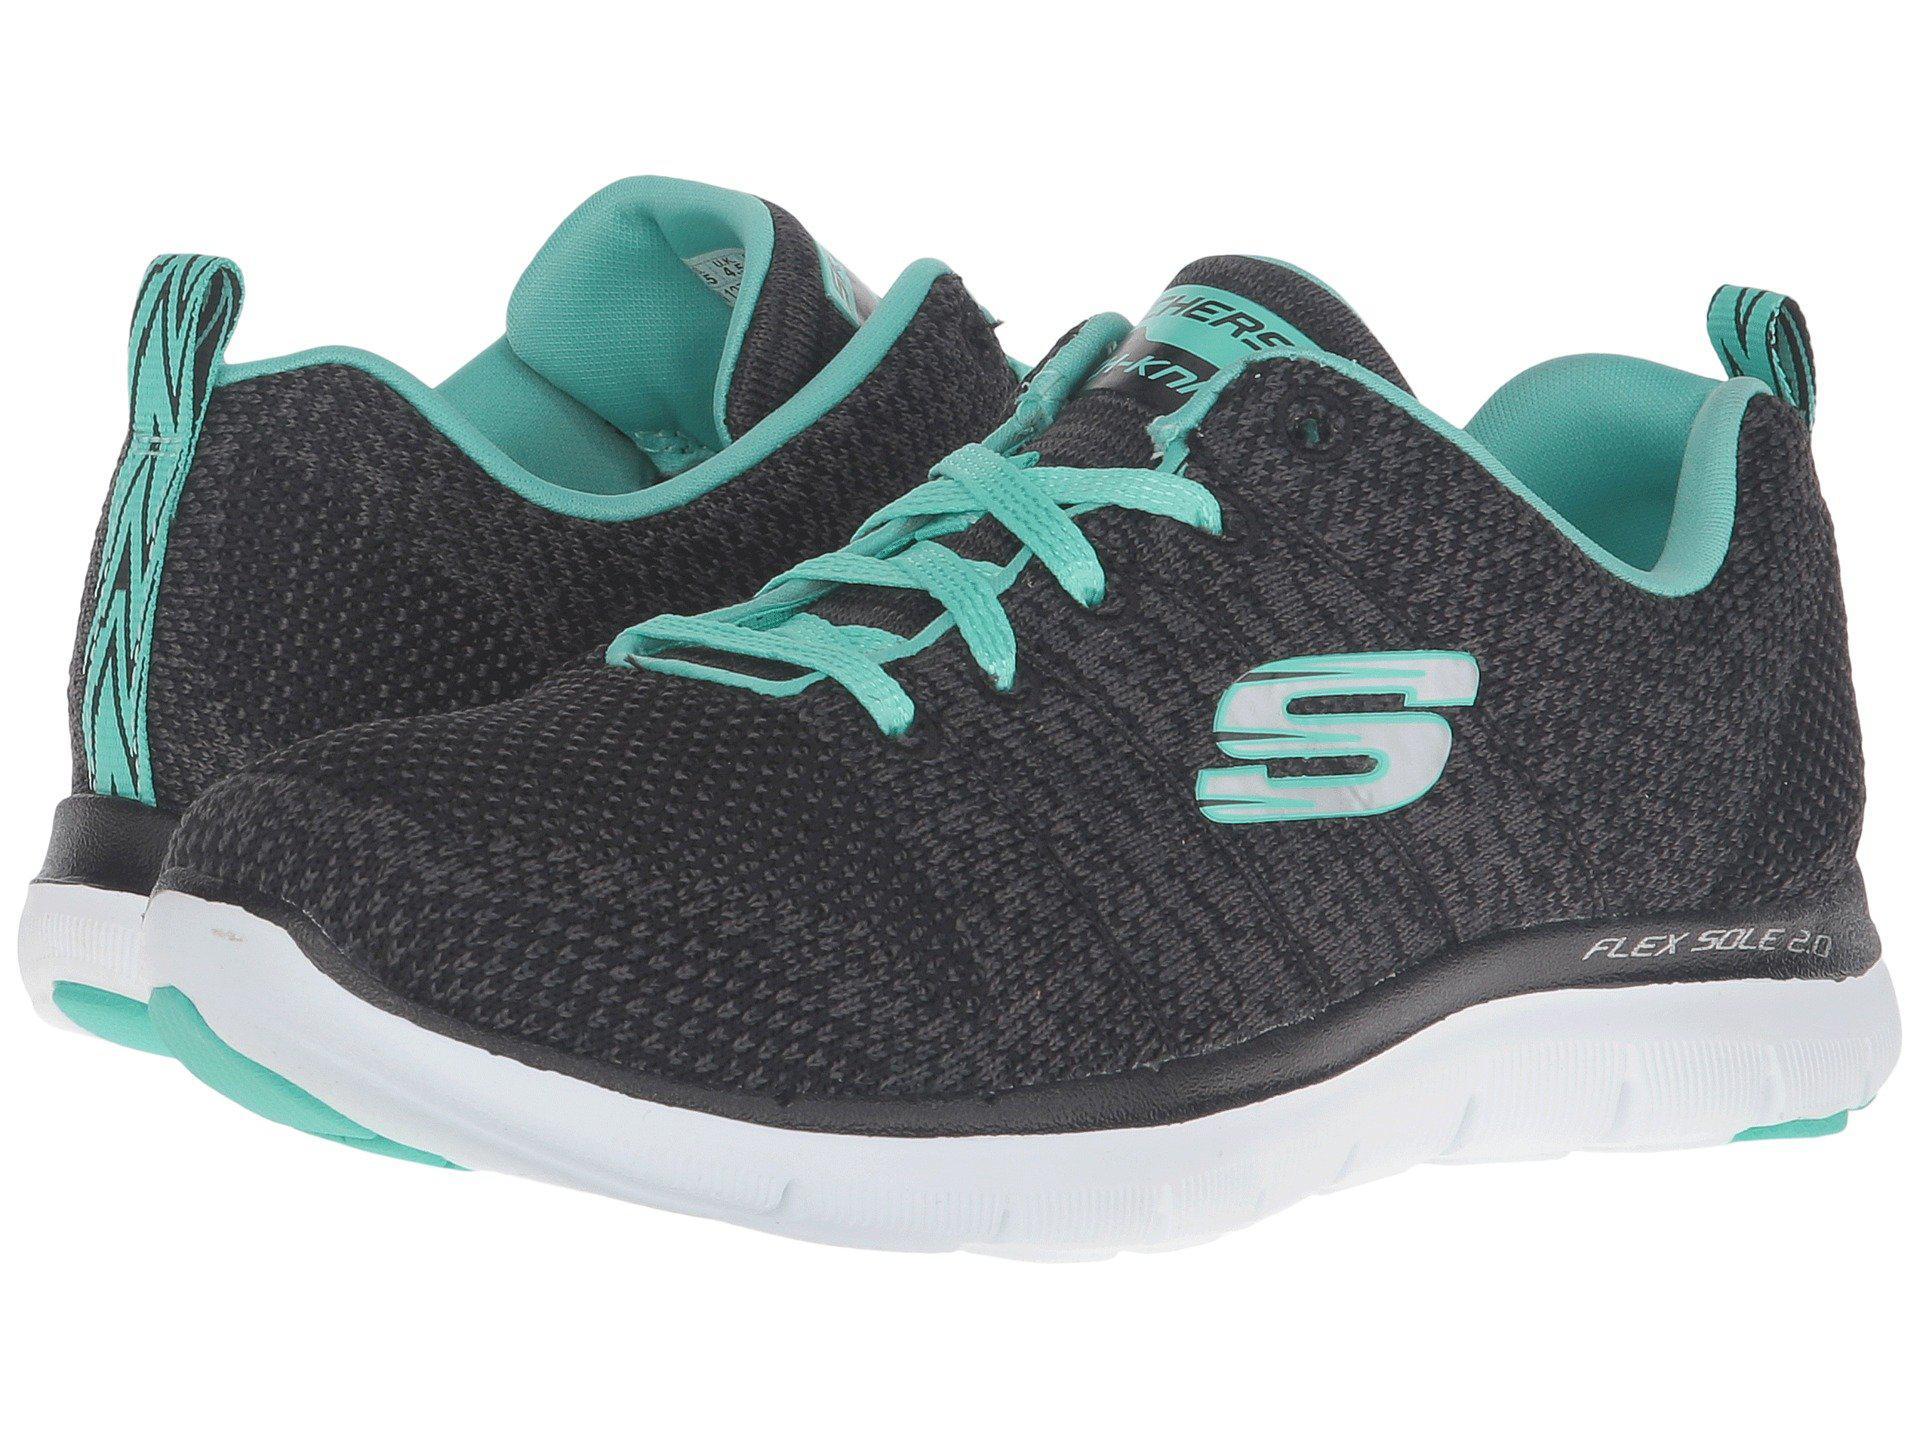 6778218b93bd Lyst - Skechers Flex Appeal 2.0 - High Energy (black aqua) Women s Shoes